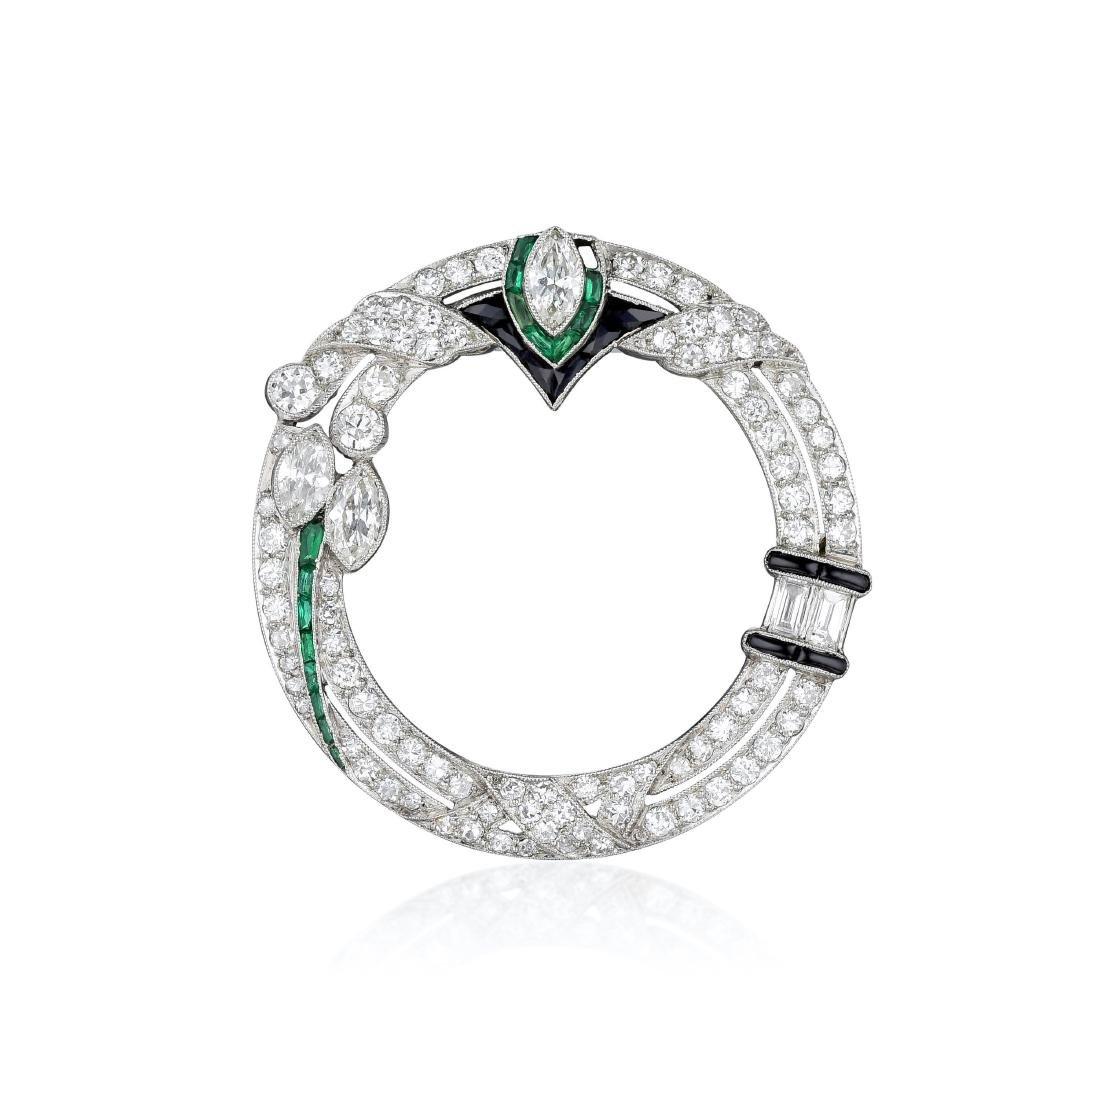 Art Deco Diamond Emerald and Black Onyx Platinum Brooch